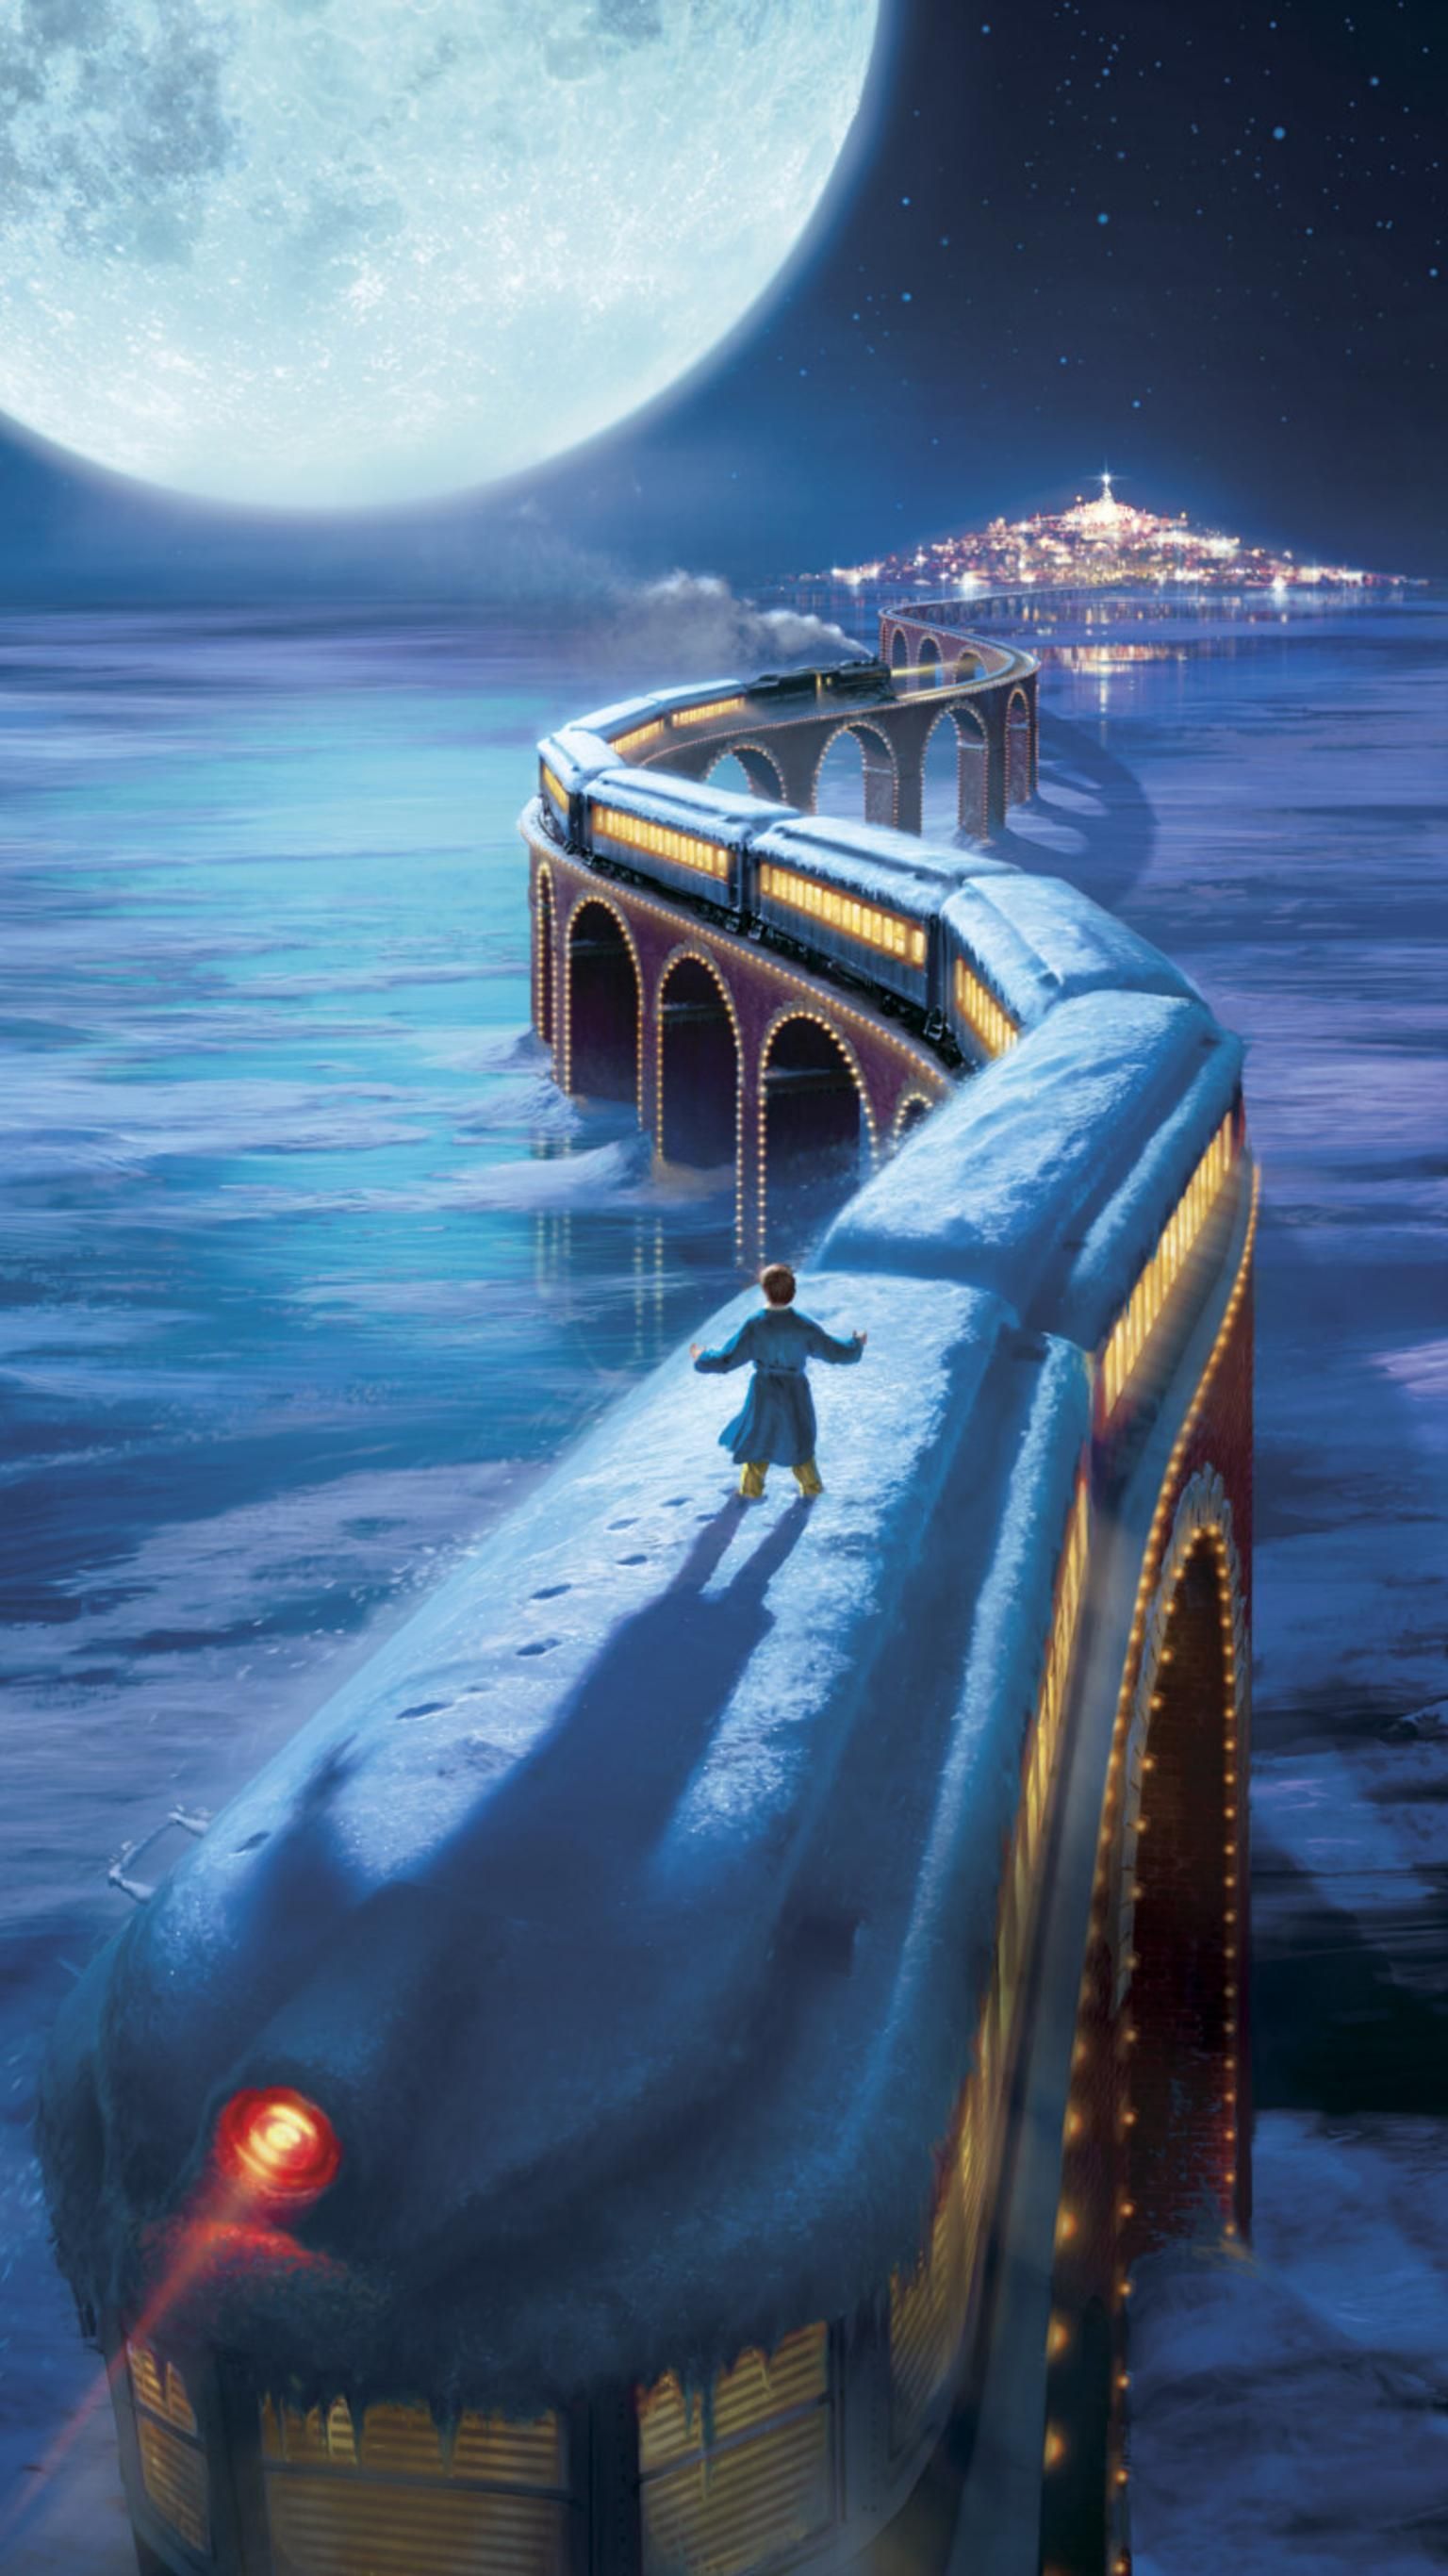 The Polar Express (2004) Phone Wallpaper | Moviemania